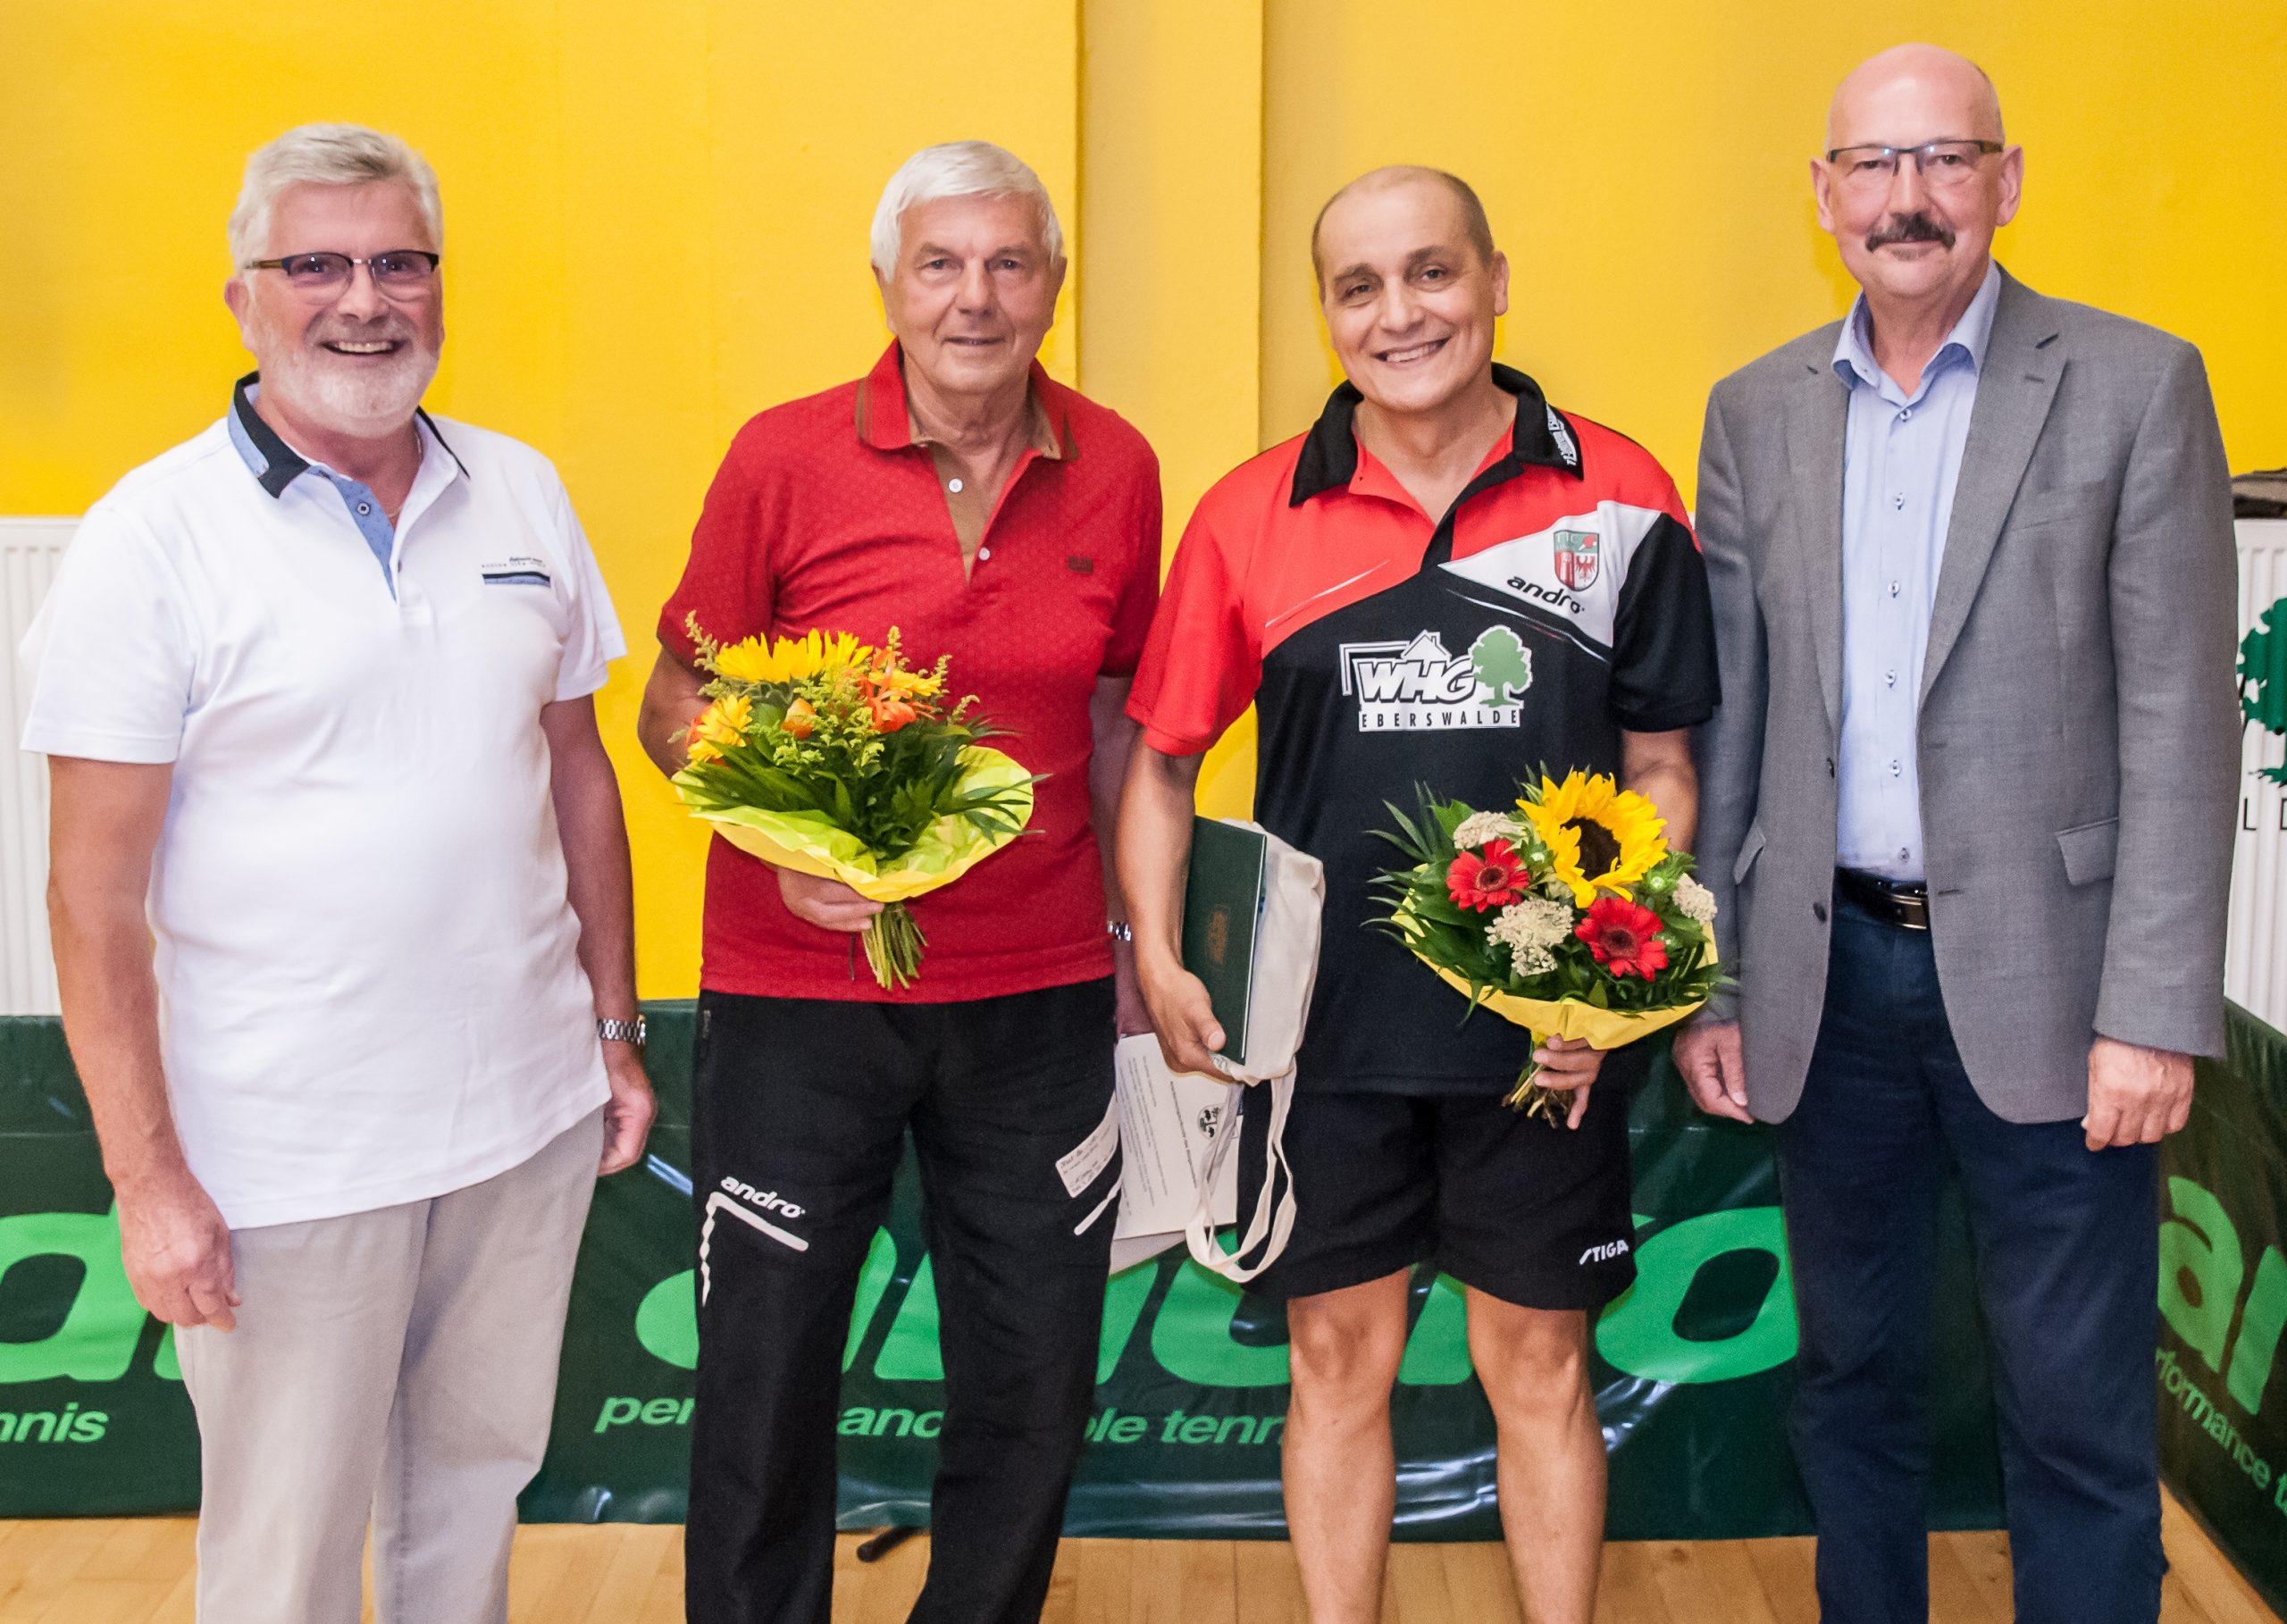 Jürgen Krenz (Präsident TTC Finow), Siegfried Lemke, Bernhard Thiel, Friedhelm Boginski